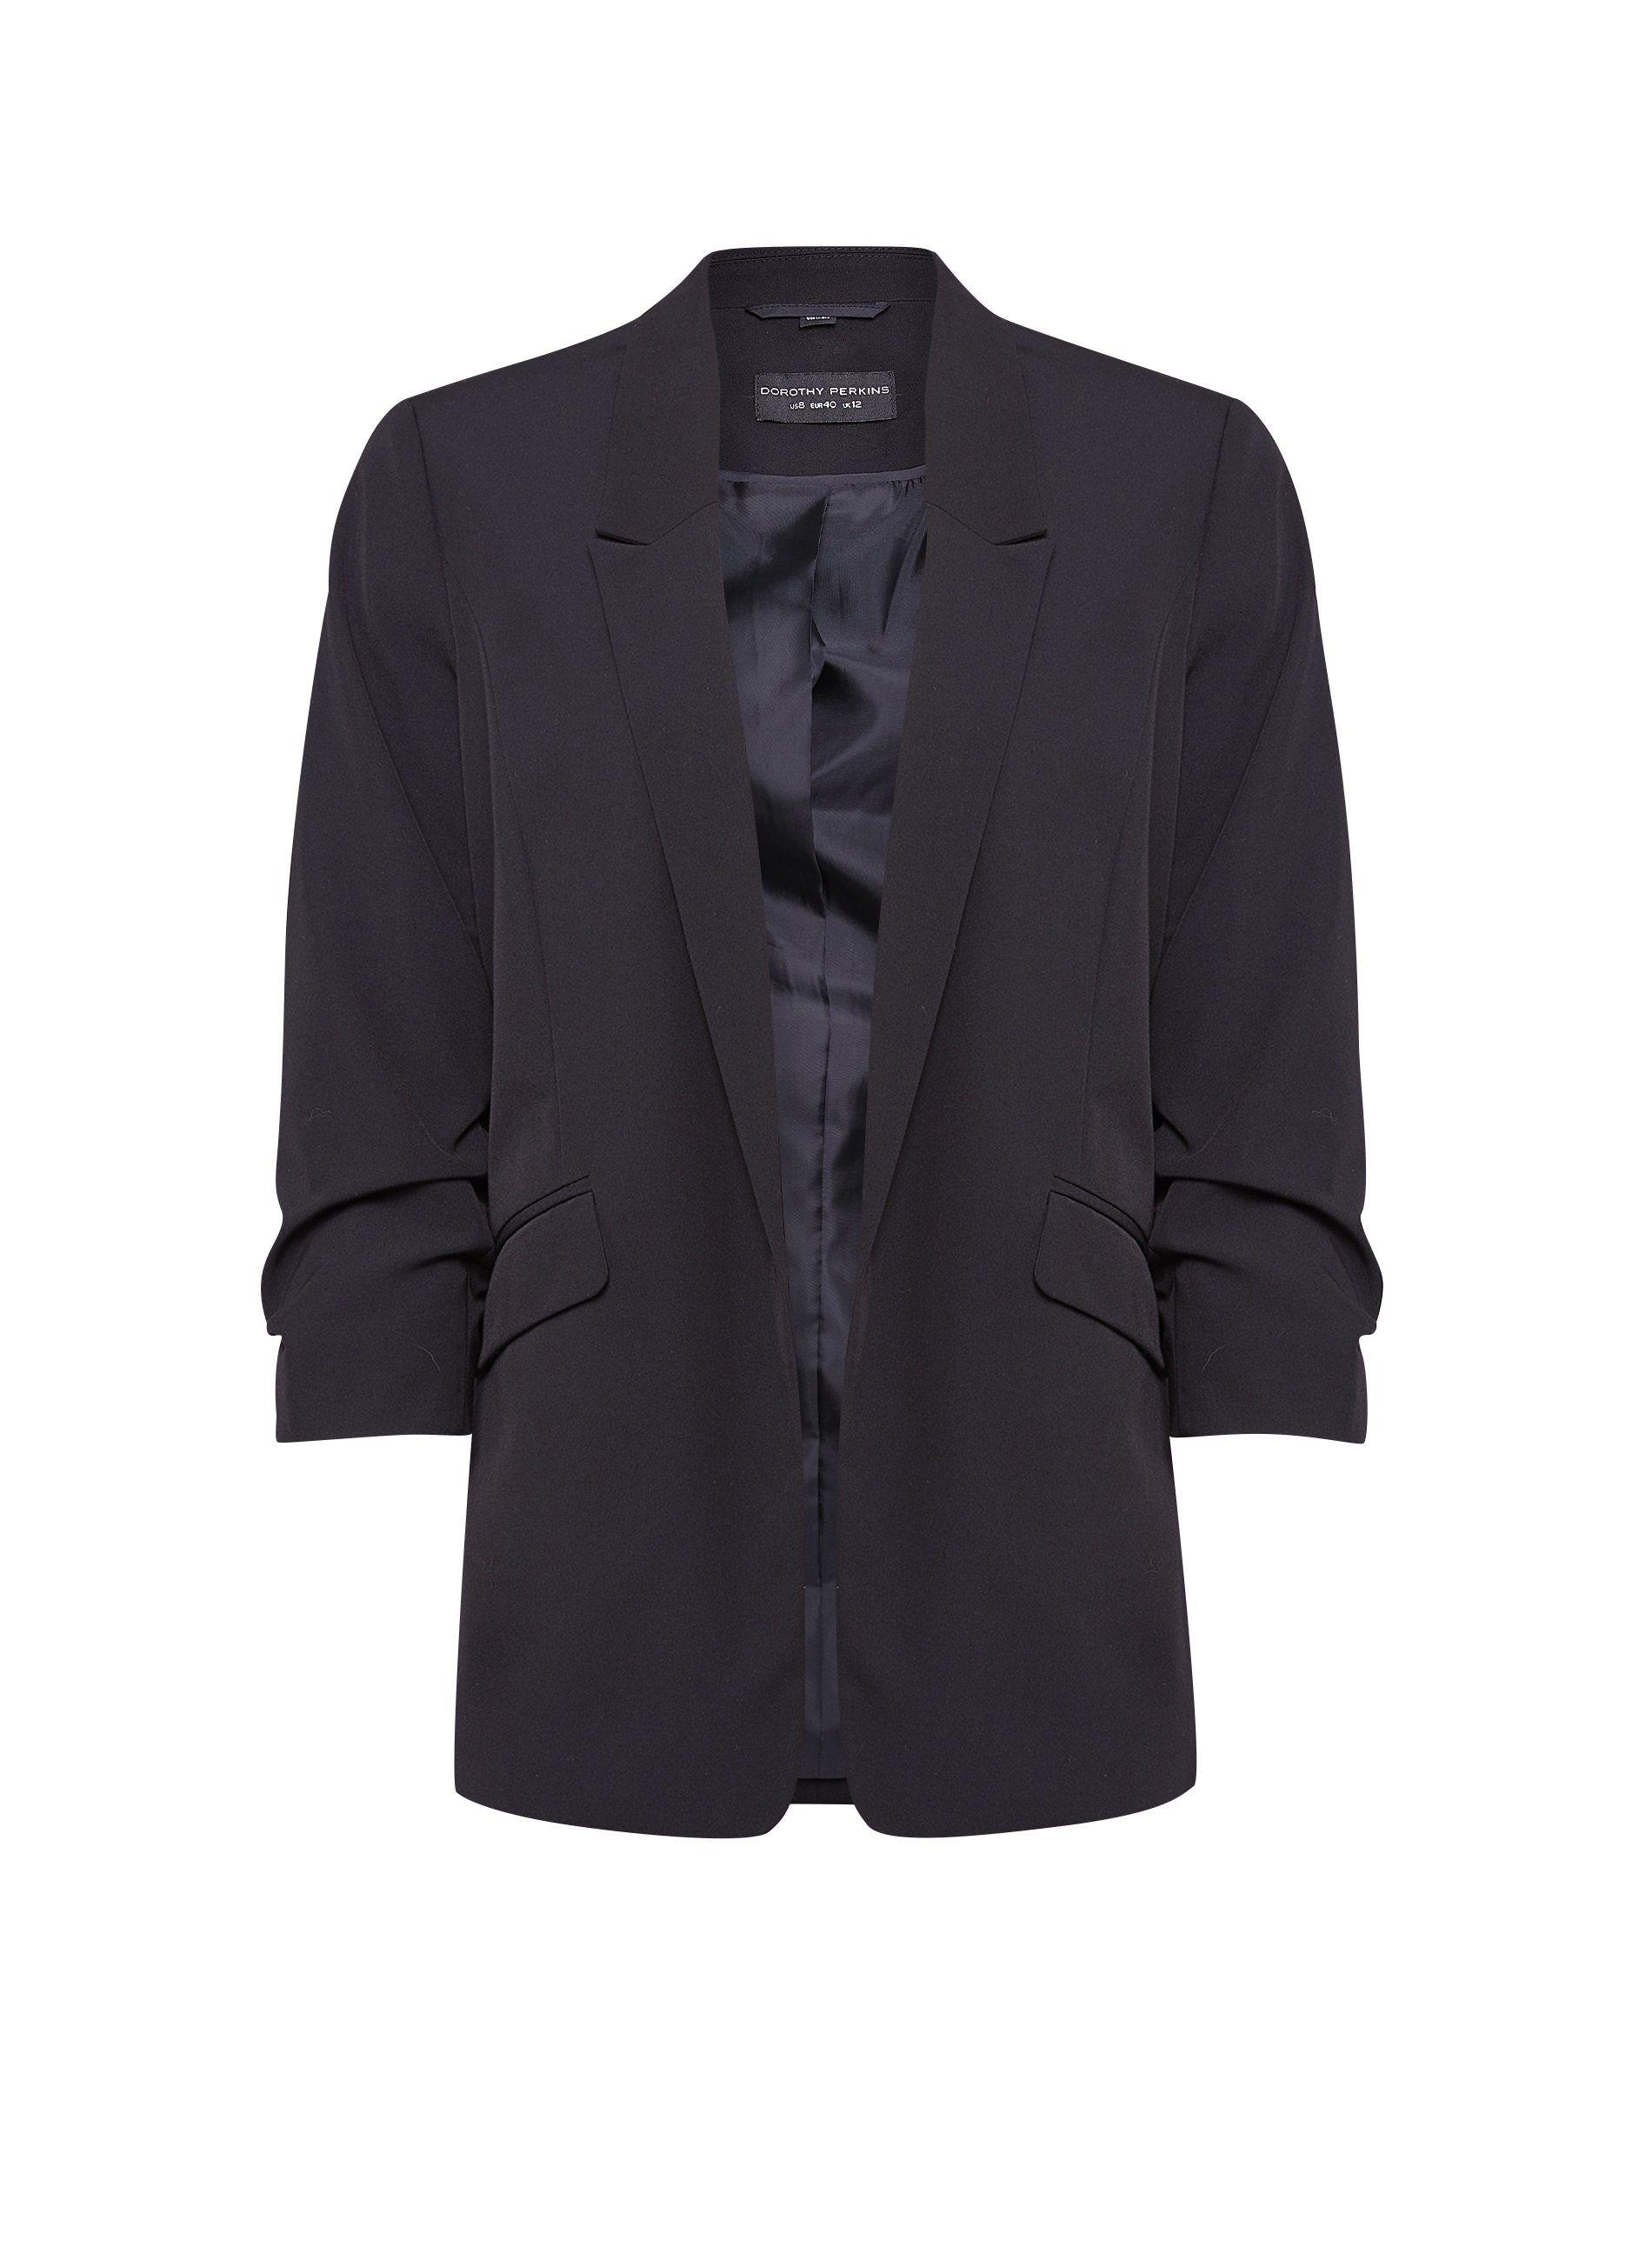 Dorothy Perkins Womens Black Ruched Sleeve Jacket Blazer 3/4 Sleeve Outerwear